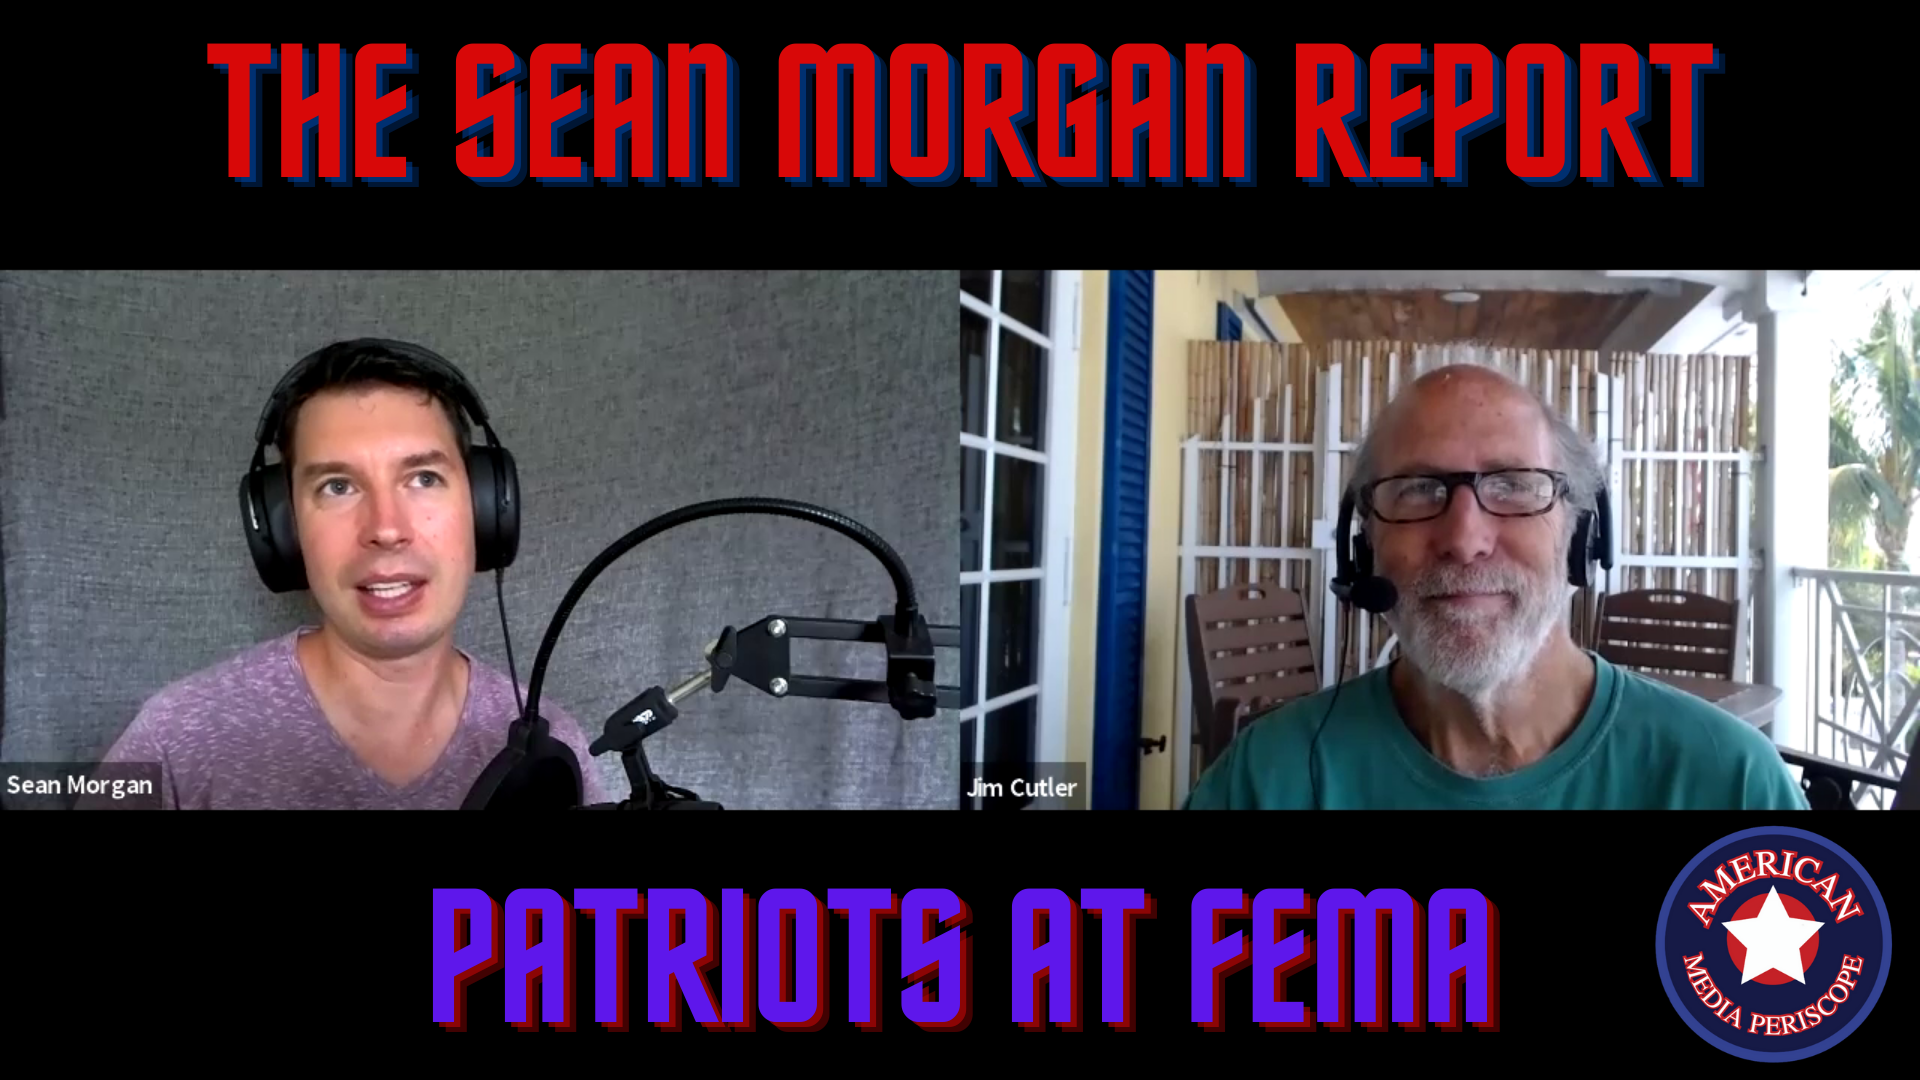 THE SEAN MORGAN REPORT (1).png